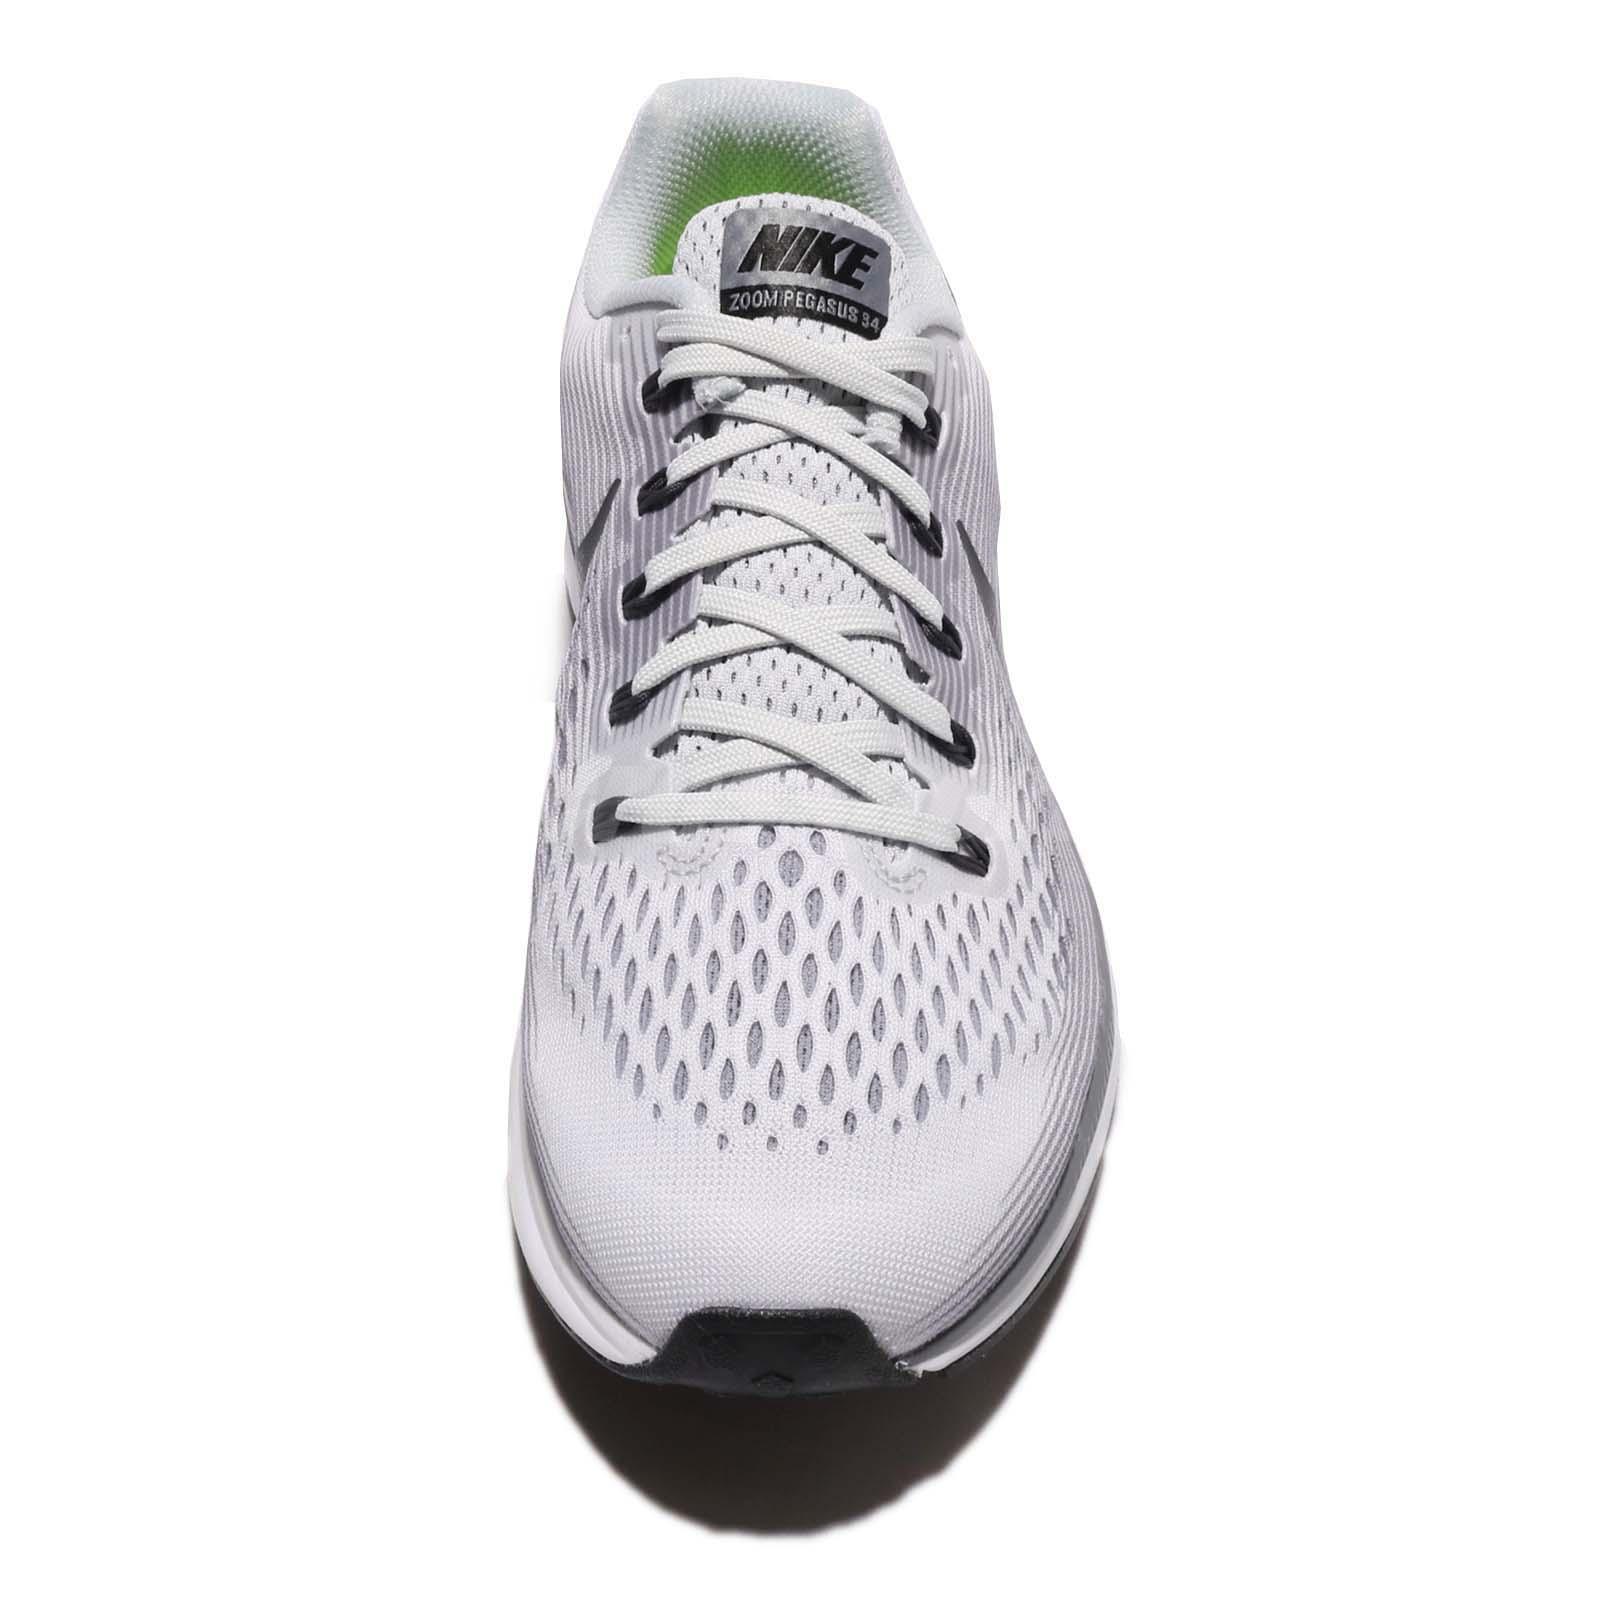 Details about Nike Air Zoom Pegasus 34 Pure Platinum Anthracite Men Running  Shoes 880555-010 7585c521c75